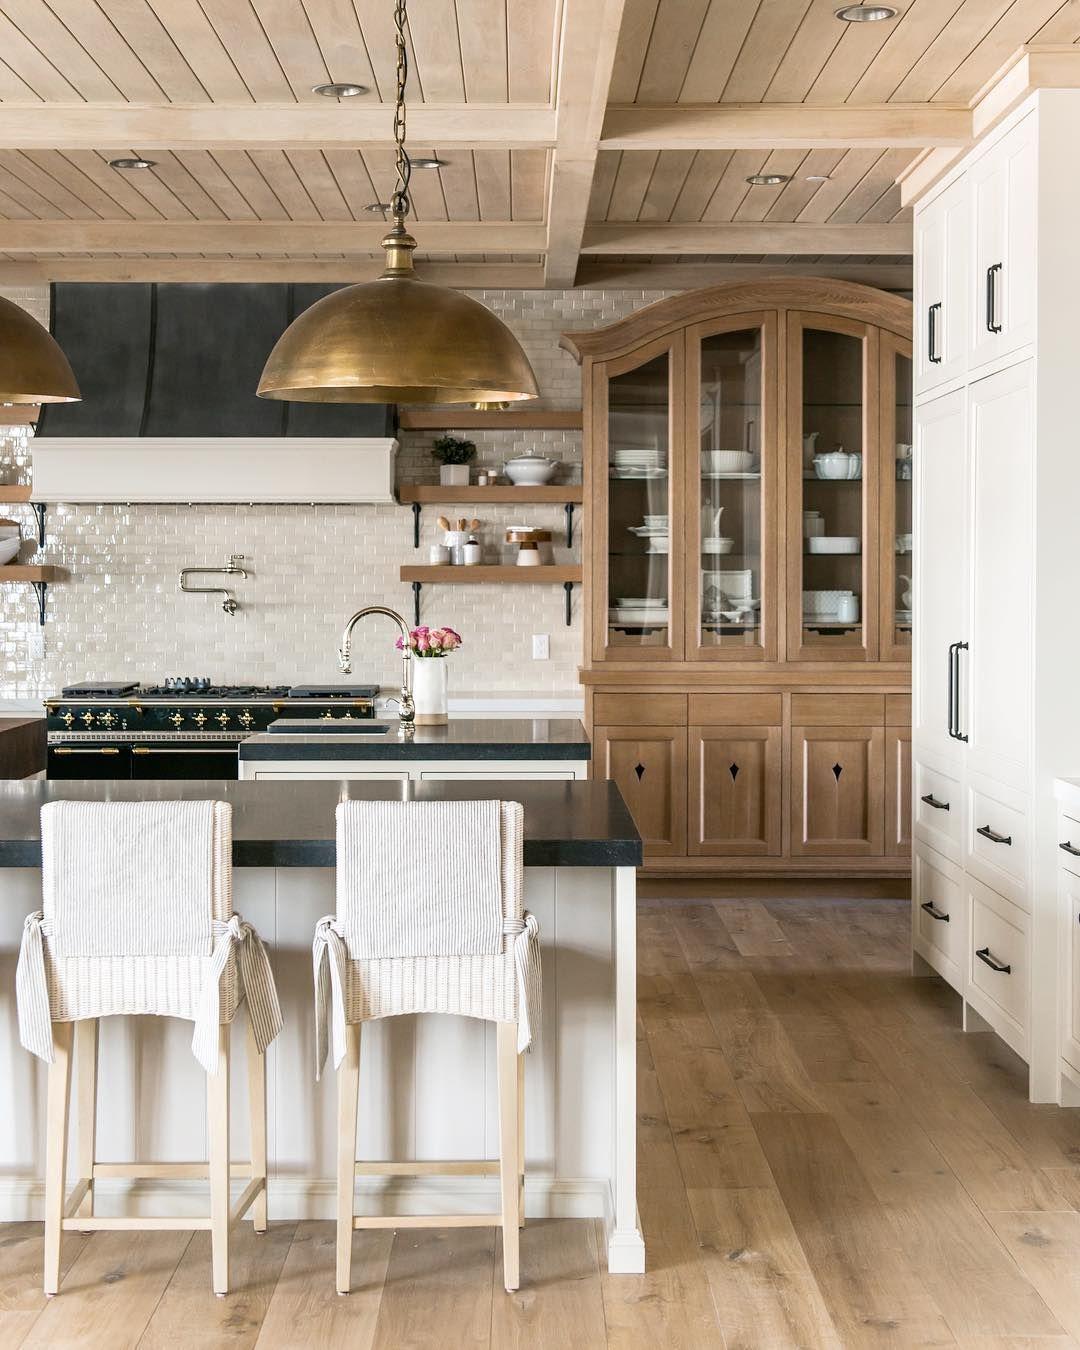 Most Popular Kitchen Flooring: This Kitchen....still One Of Our Most Popular Design